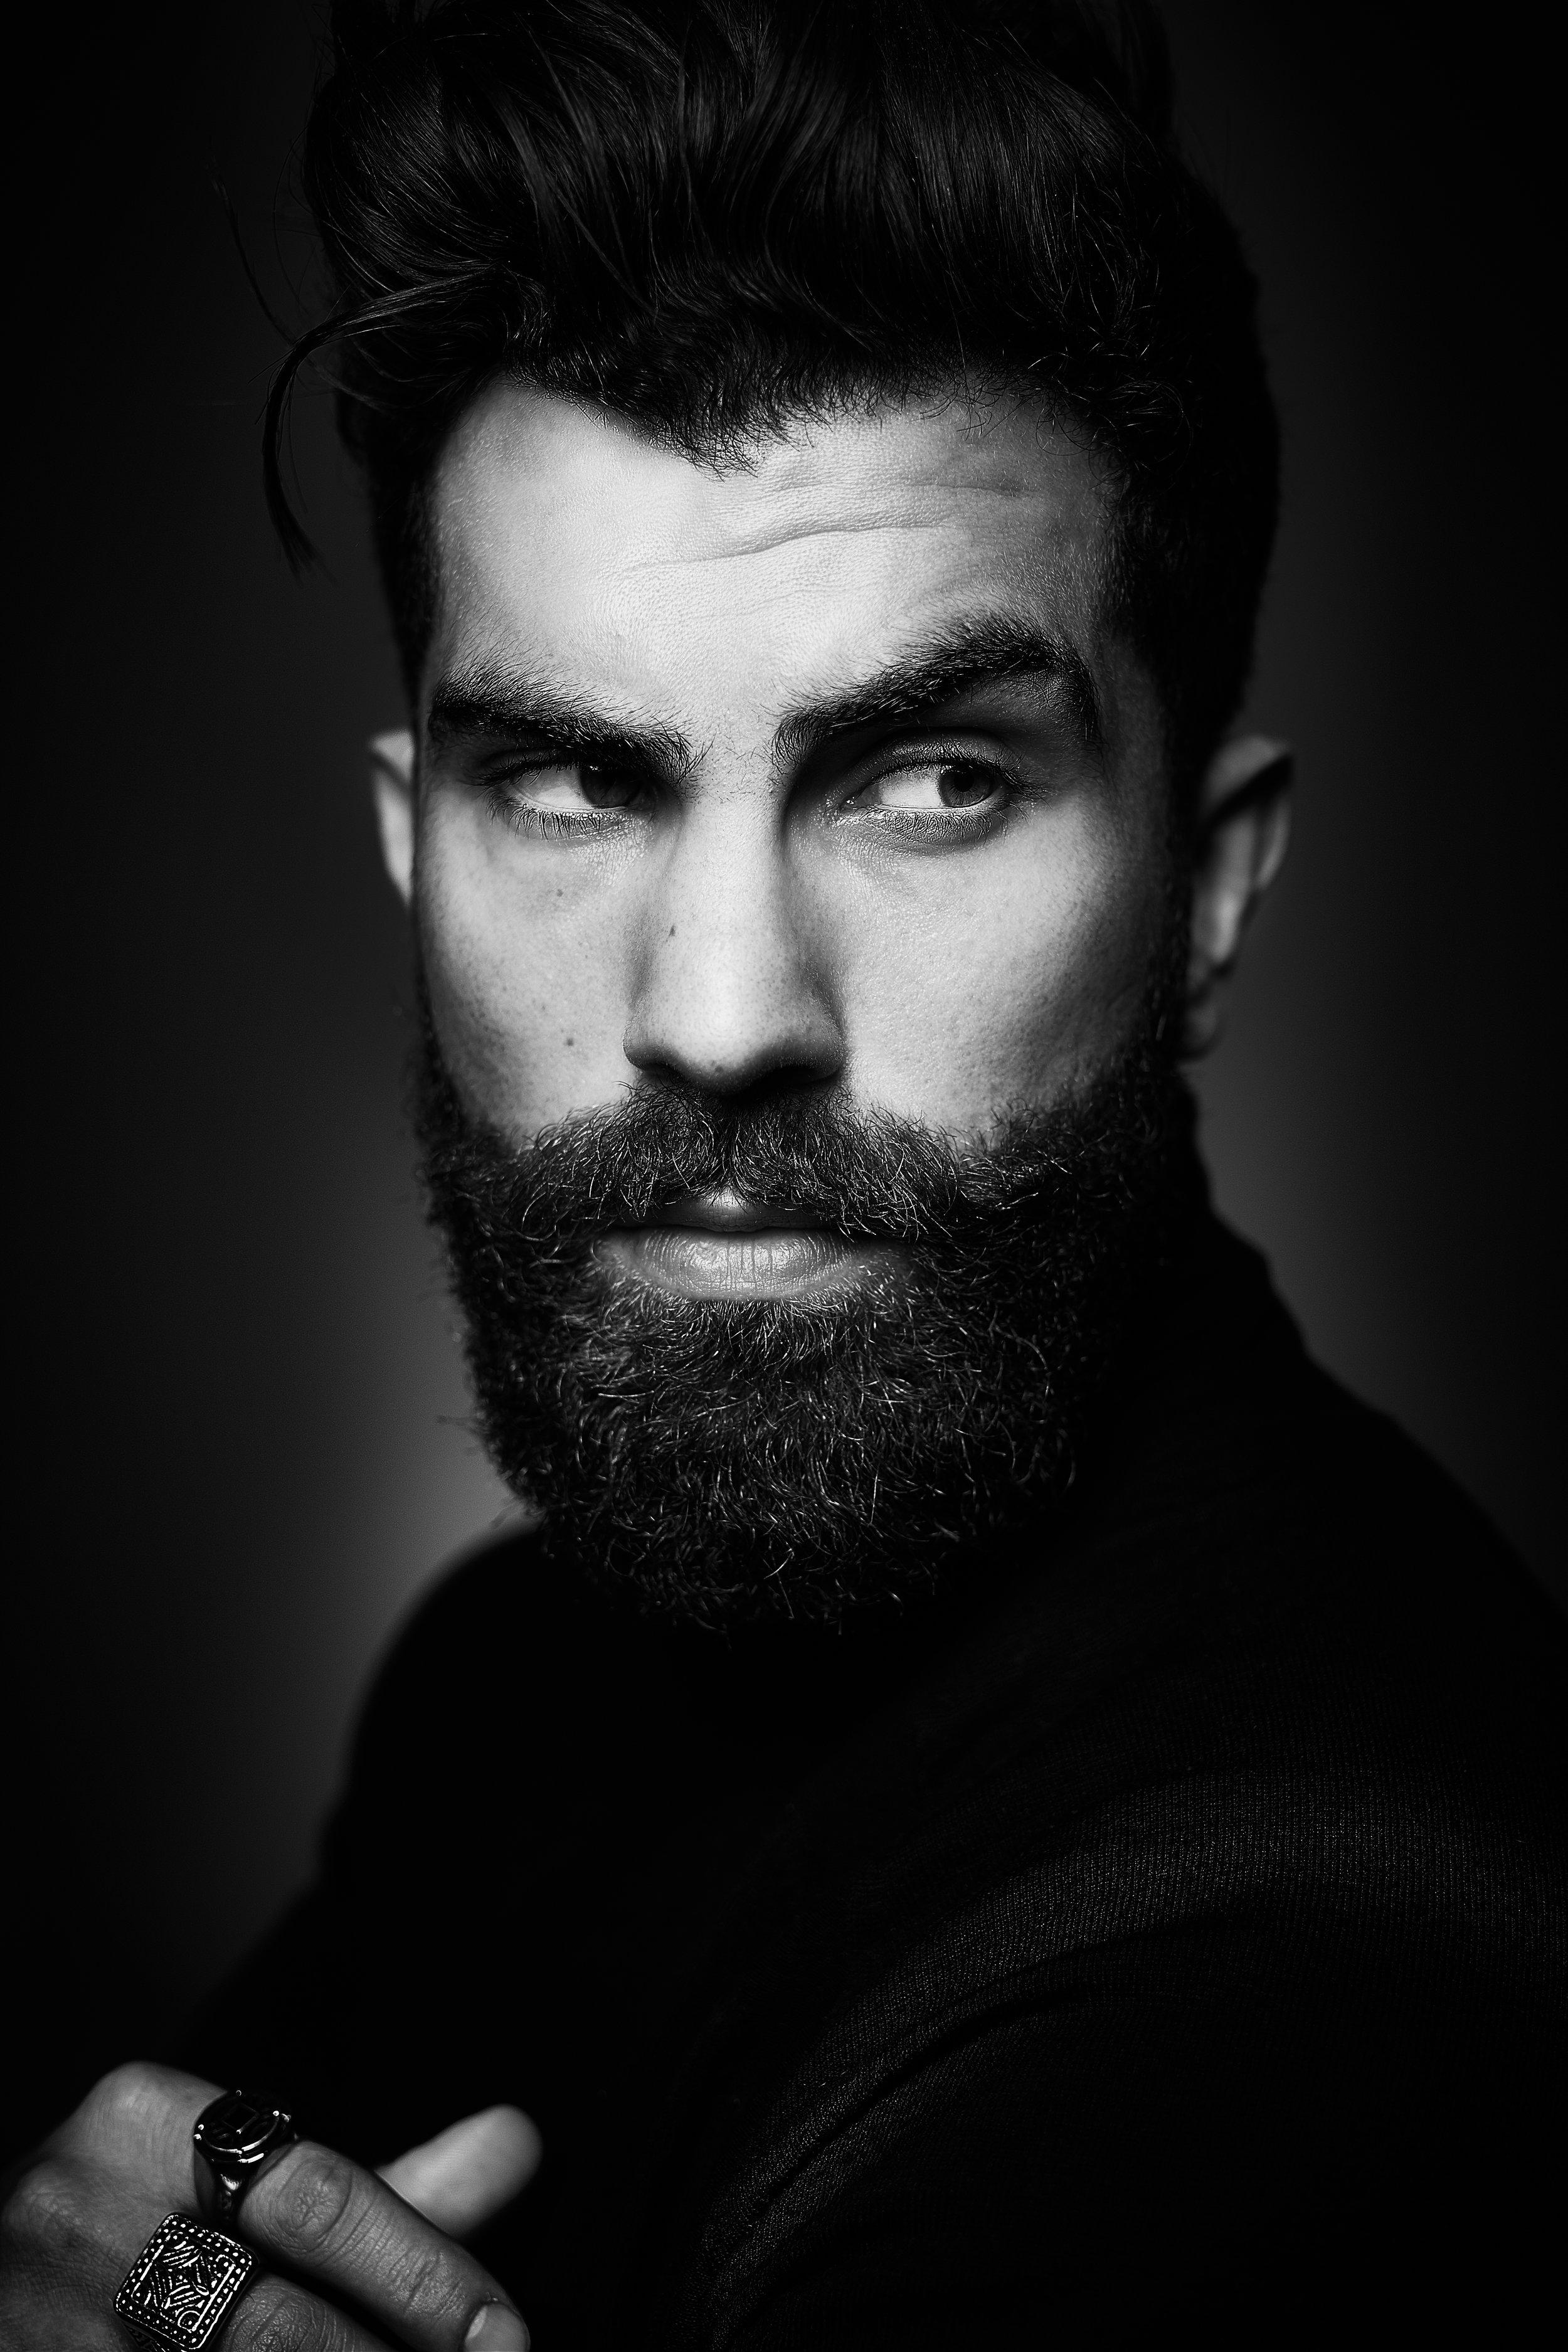 Portrait_063_Reza_Jackson_10428.jpg